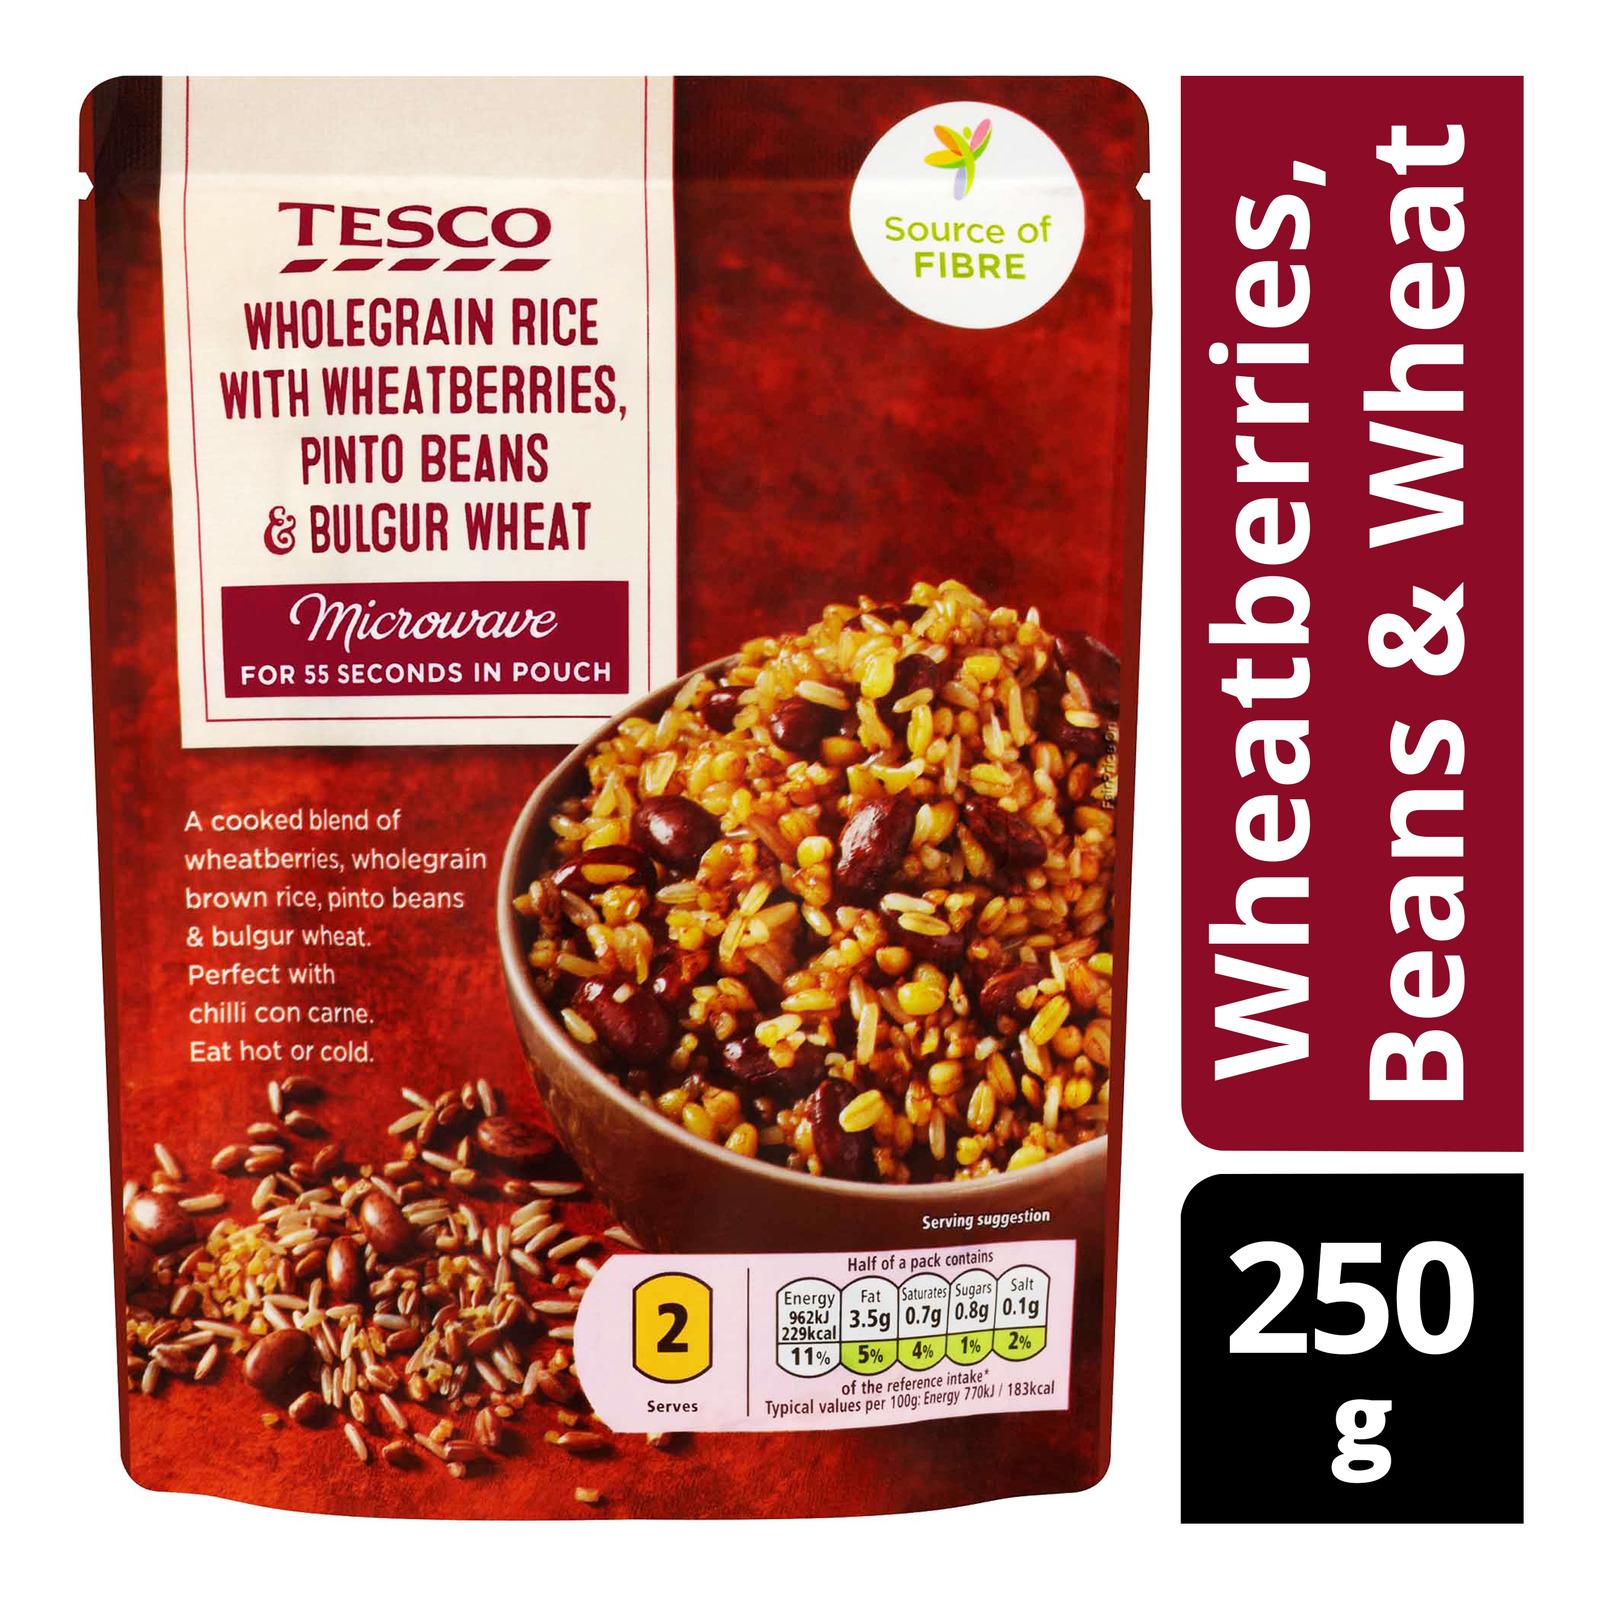 Tesco Instant Wholegrain Rice Pouch - Wheatberries, Beans & Wheat